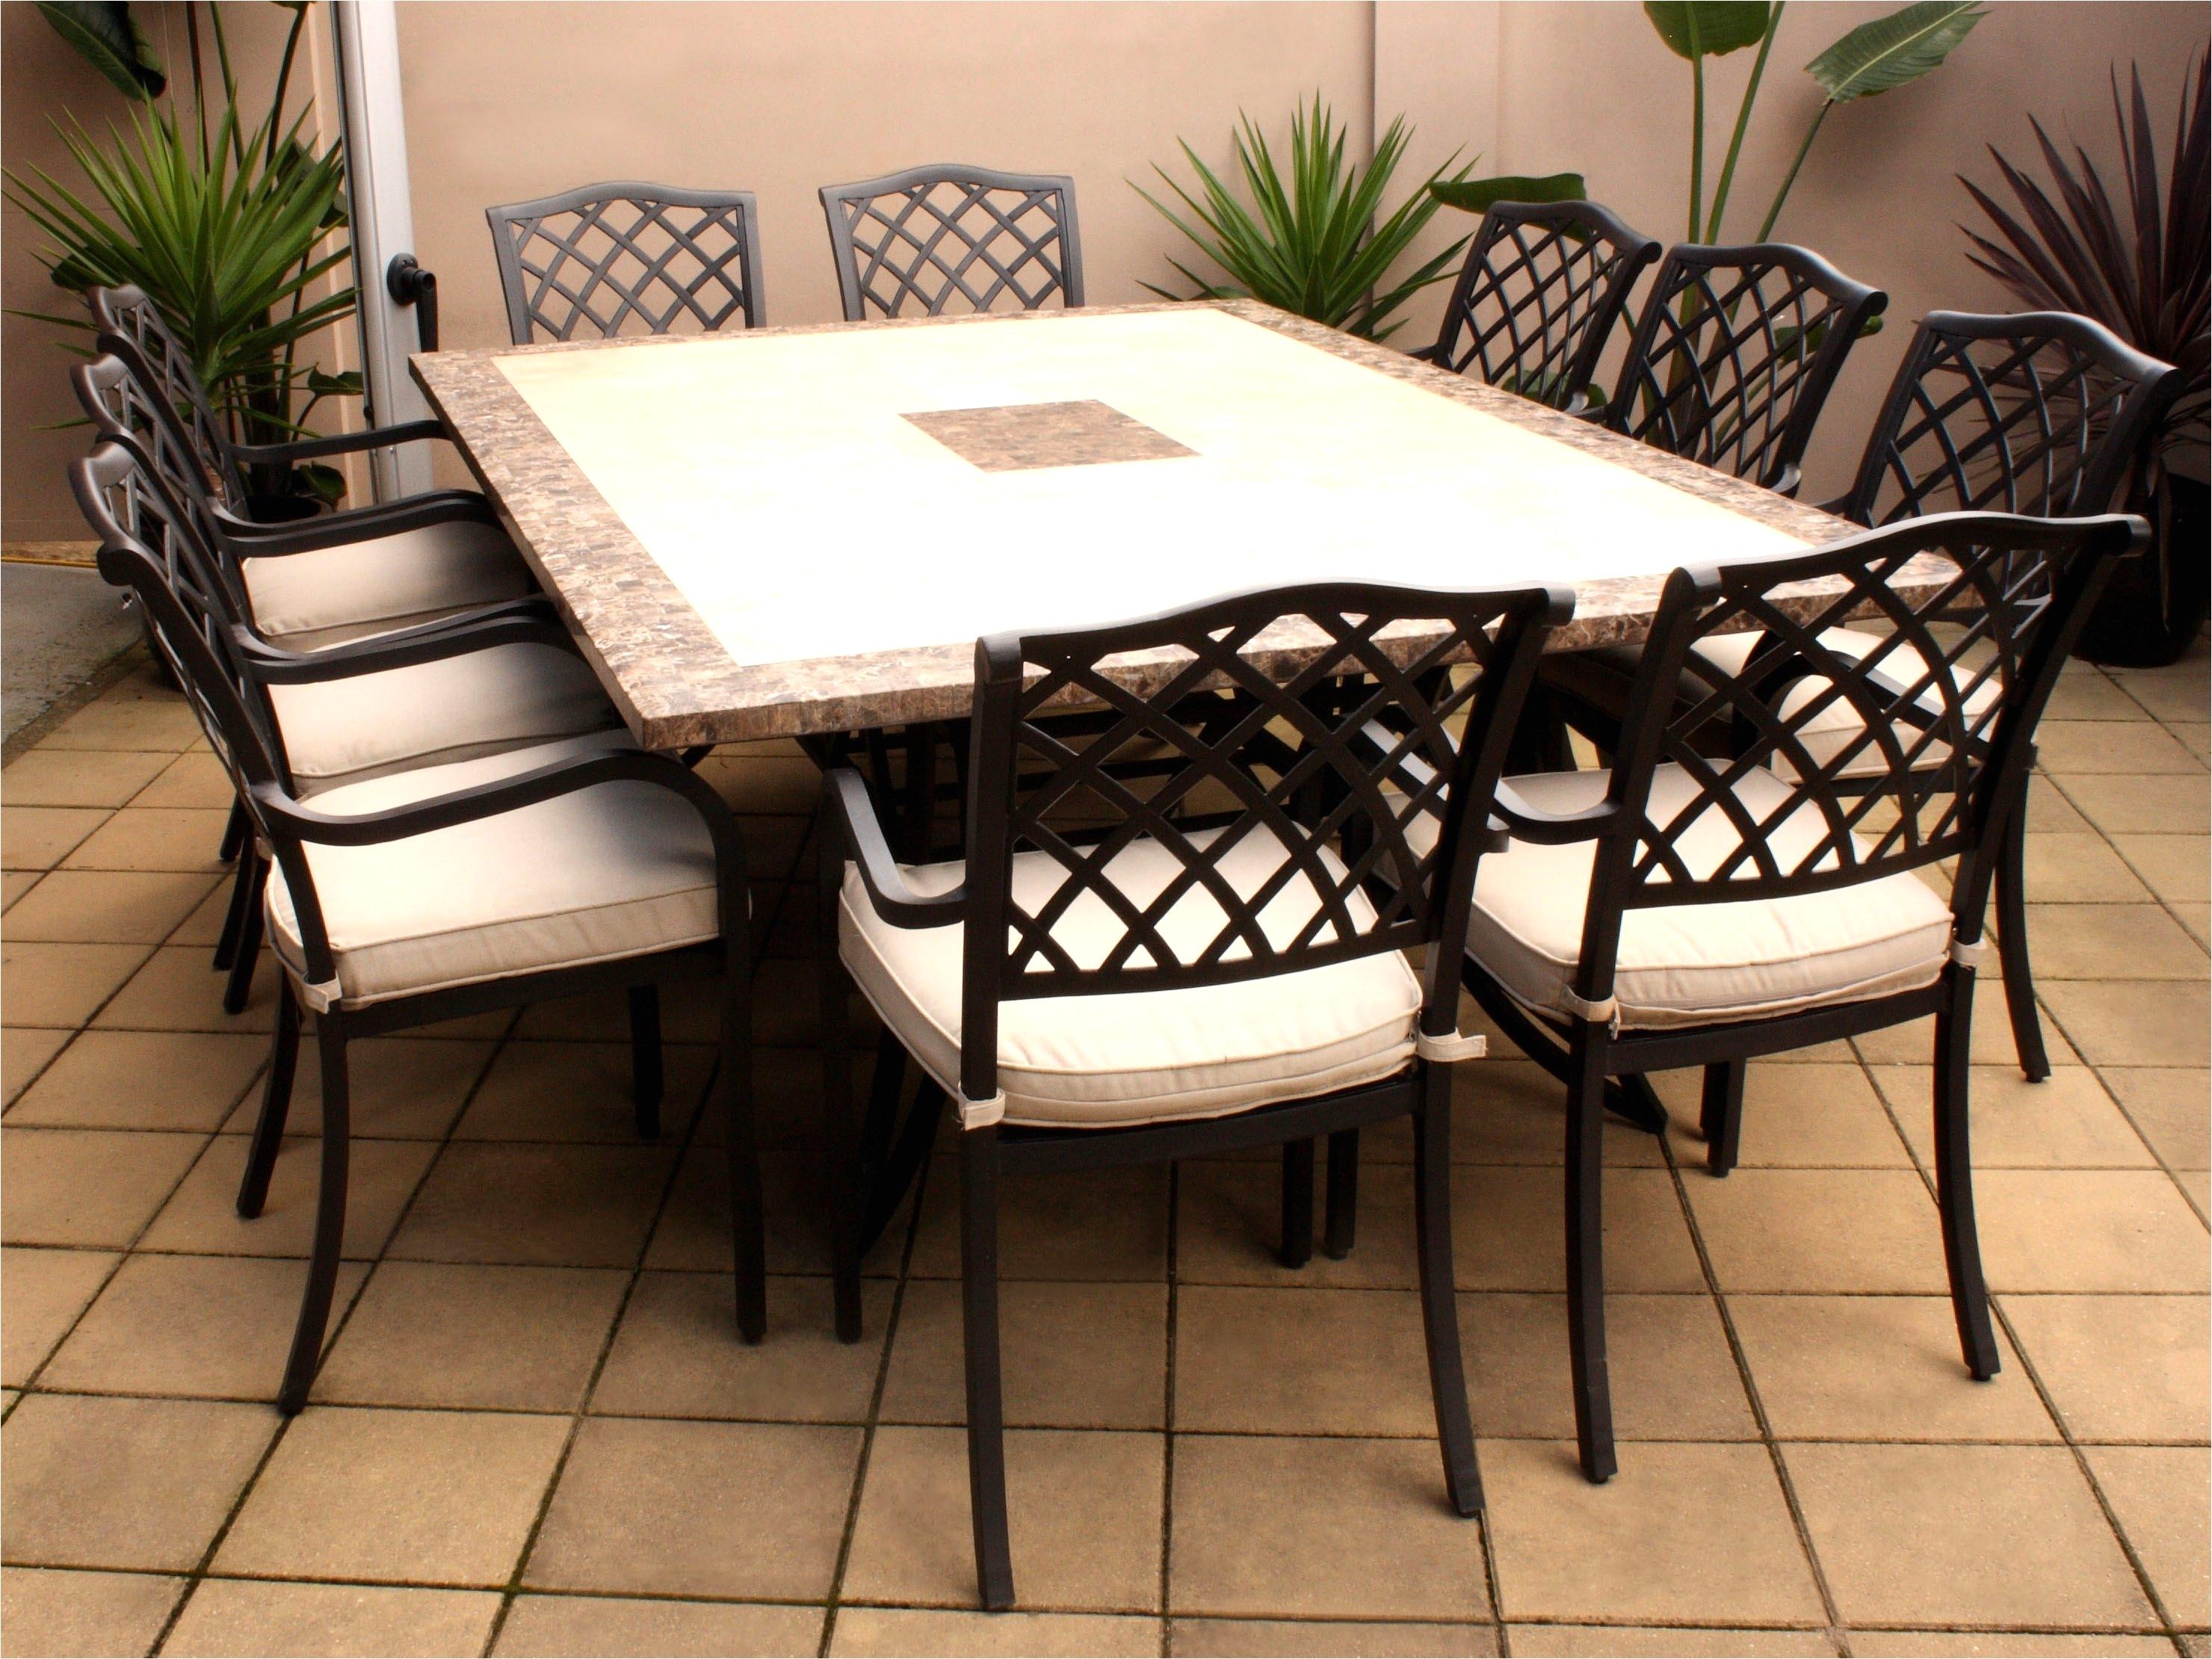 25 fresh outdoor furniture repairs melbourne 25 fresh outdoor furniture repairs melbourne